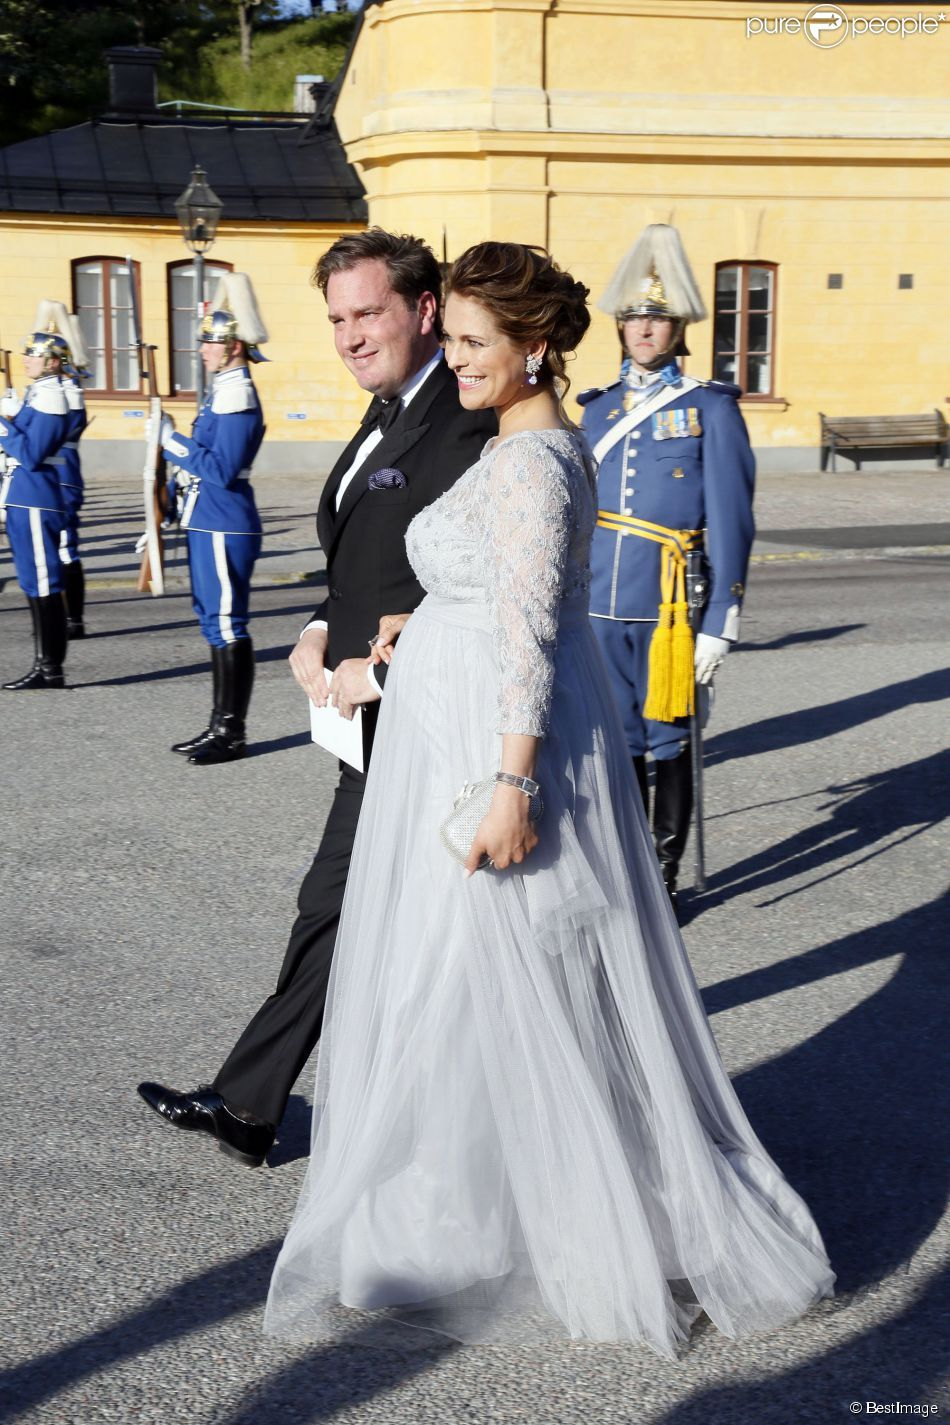 La princesse Madeleine de Suède, enceinte, son mari Christopher (Chris) O'Neill - Arrivées au...